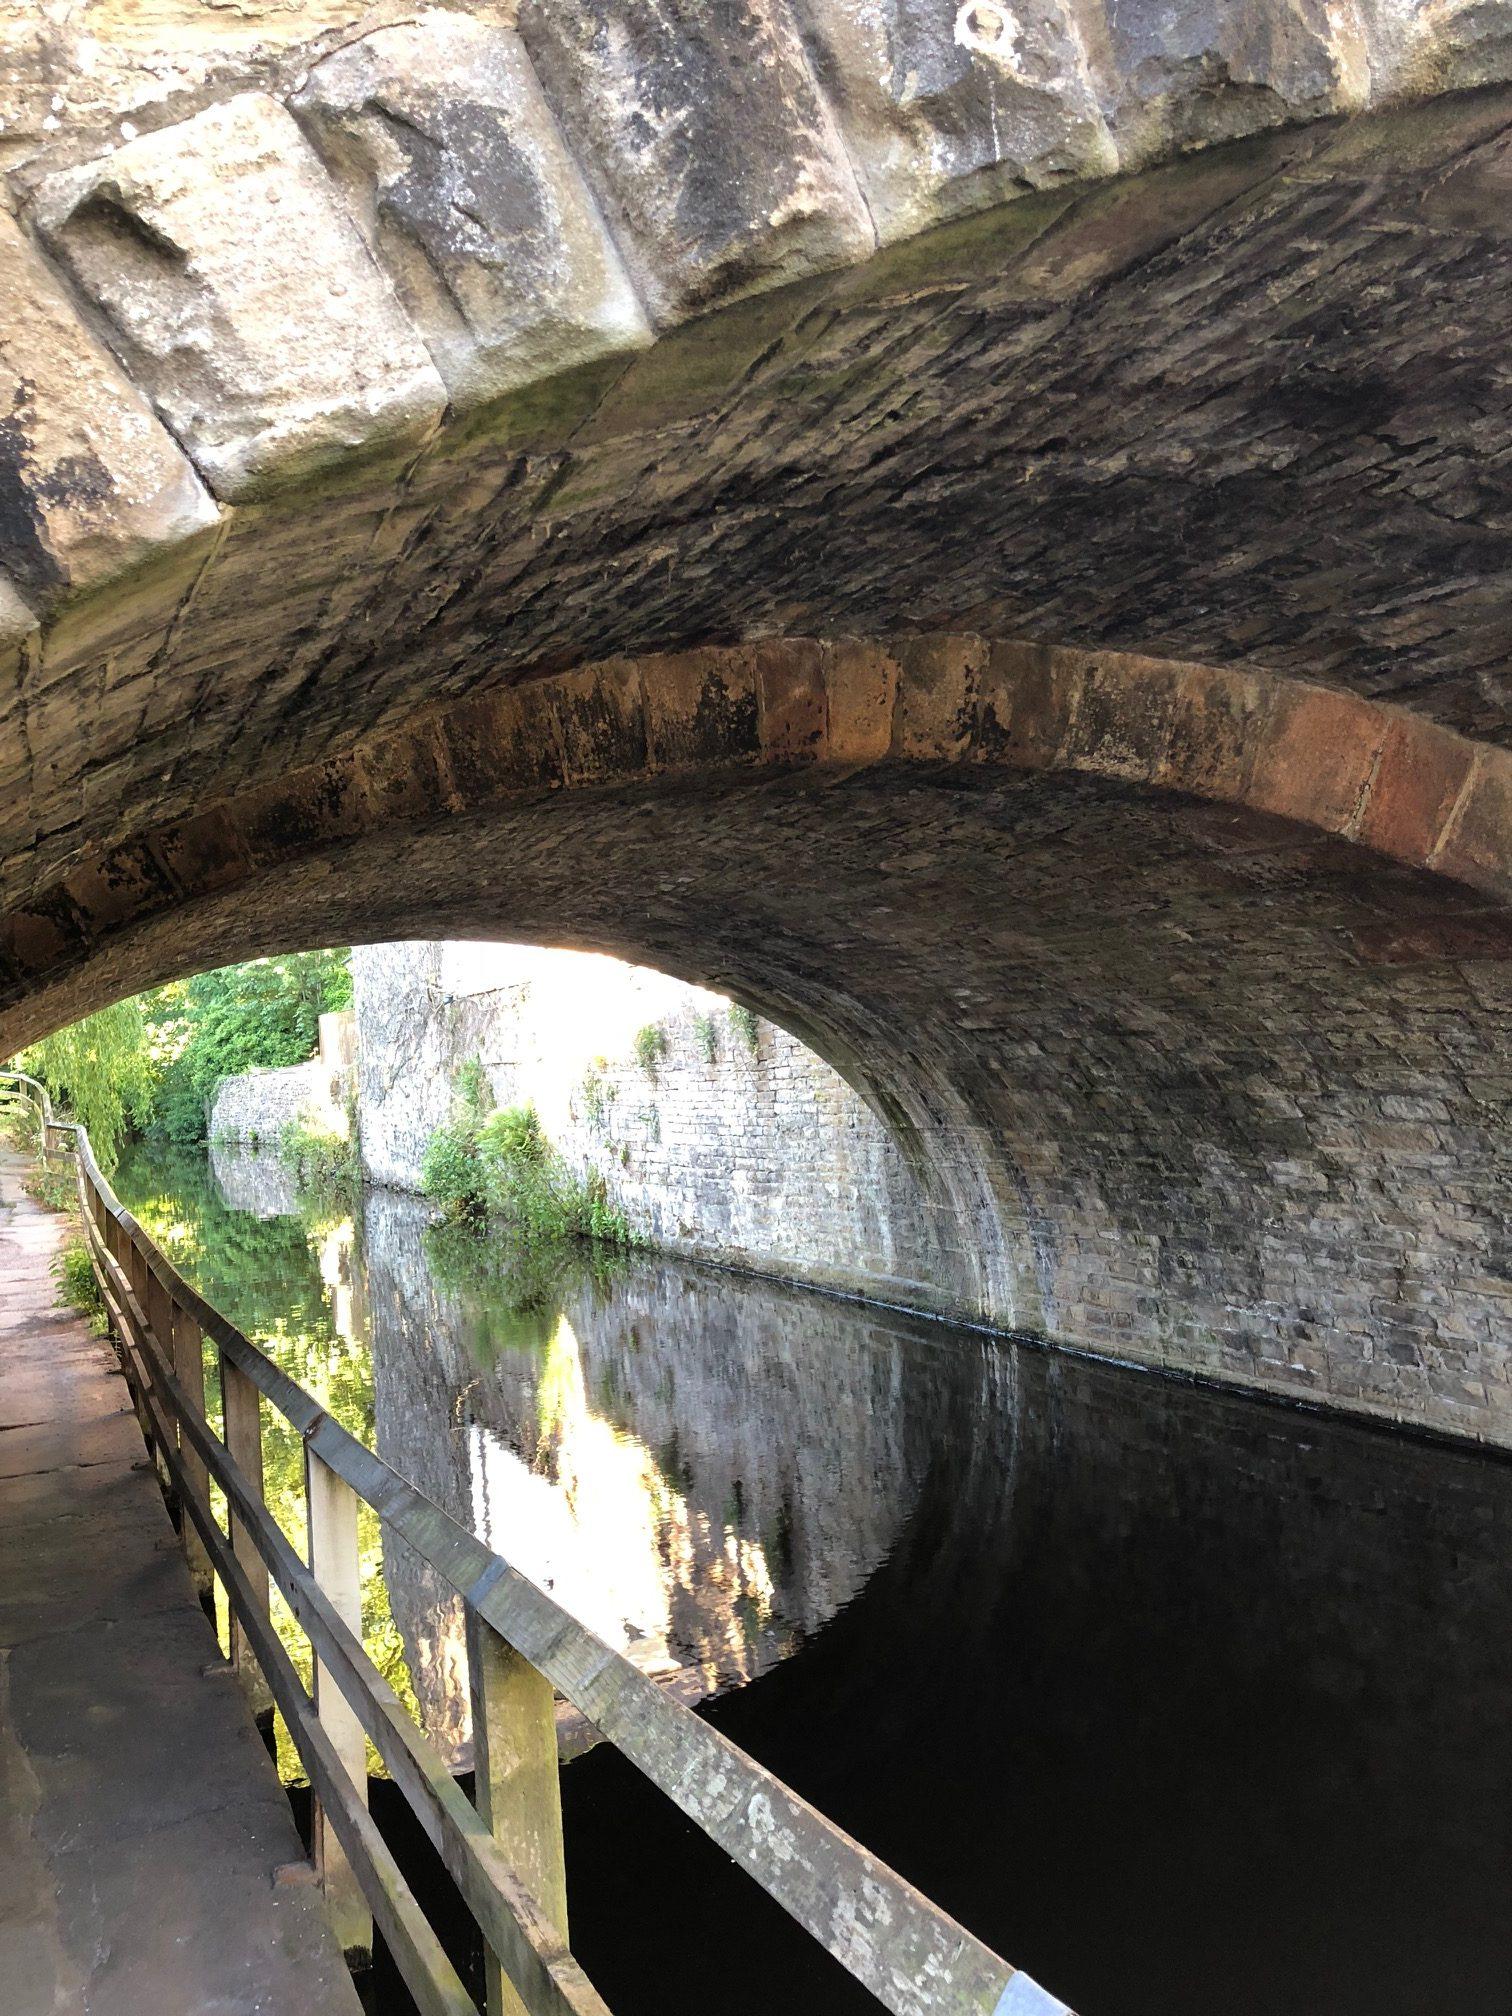 Skipton canal bridge and reflection